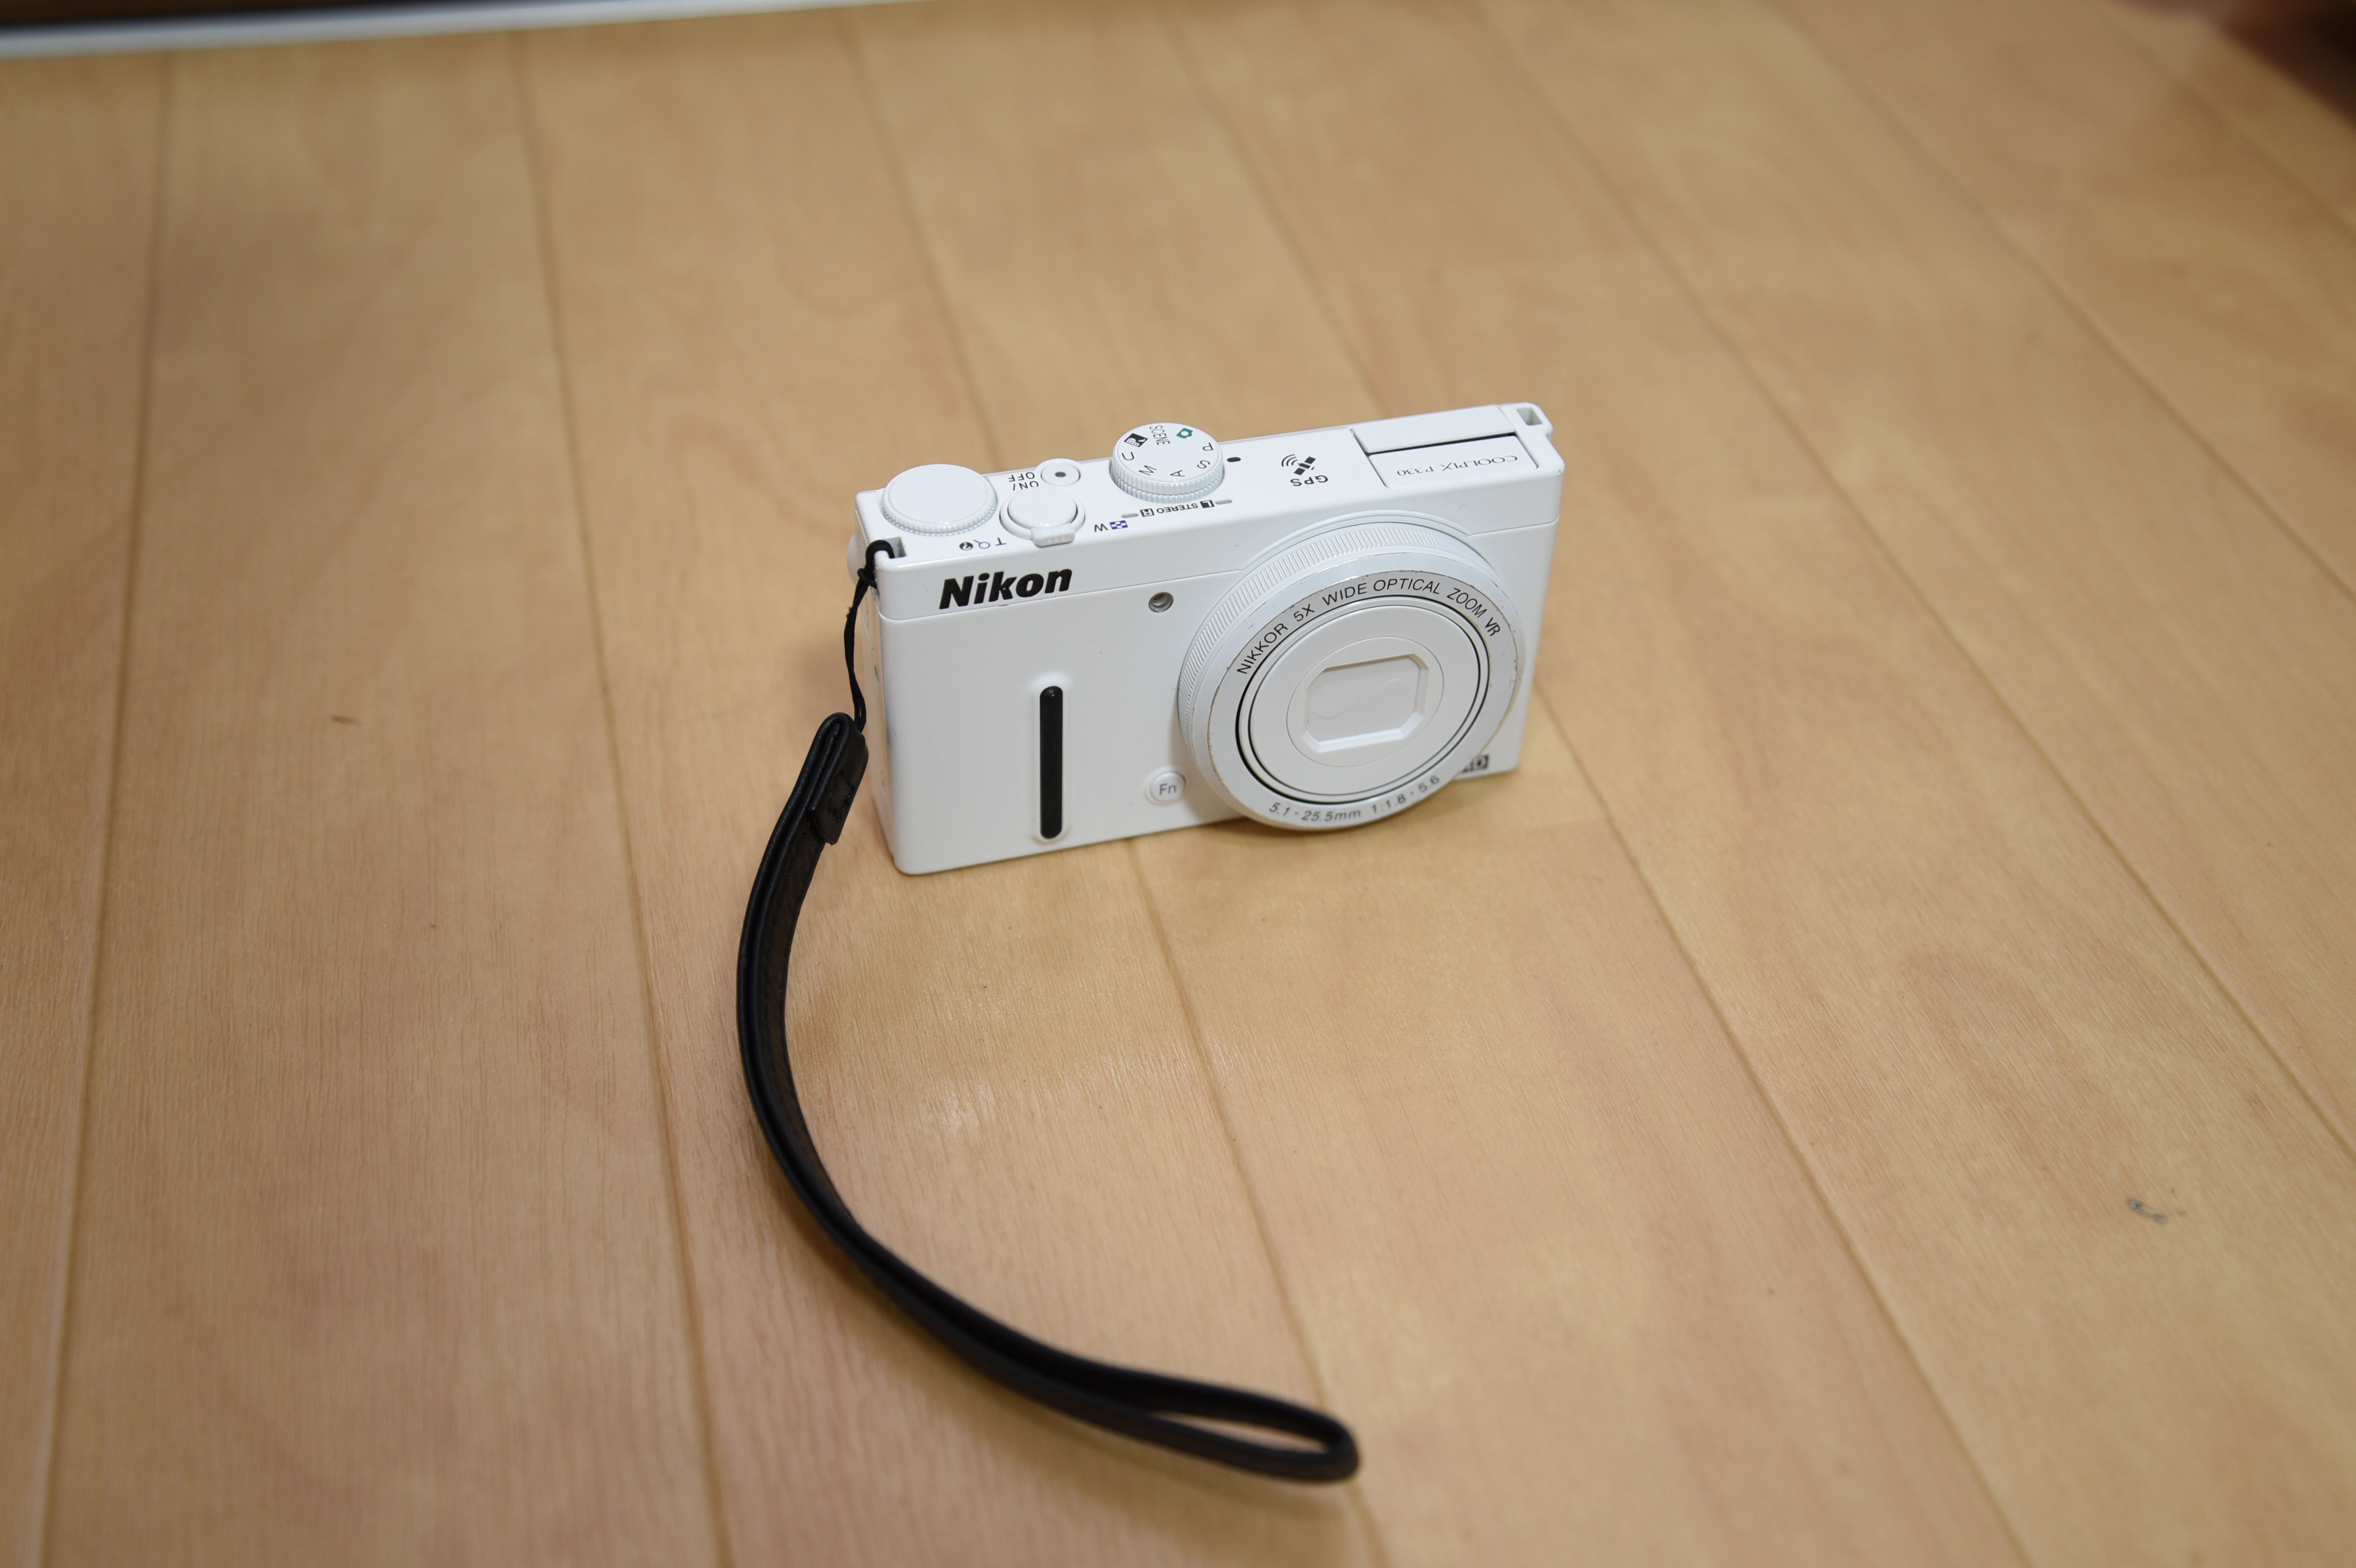 【Nikon COOLPIX P330】~サブ機におすすめ!!~